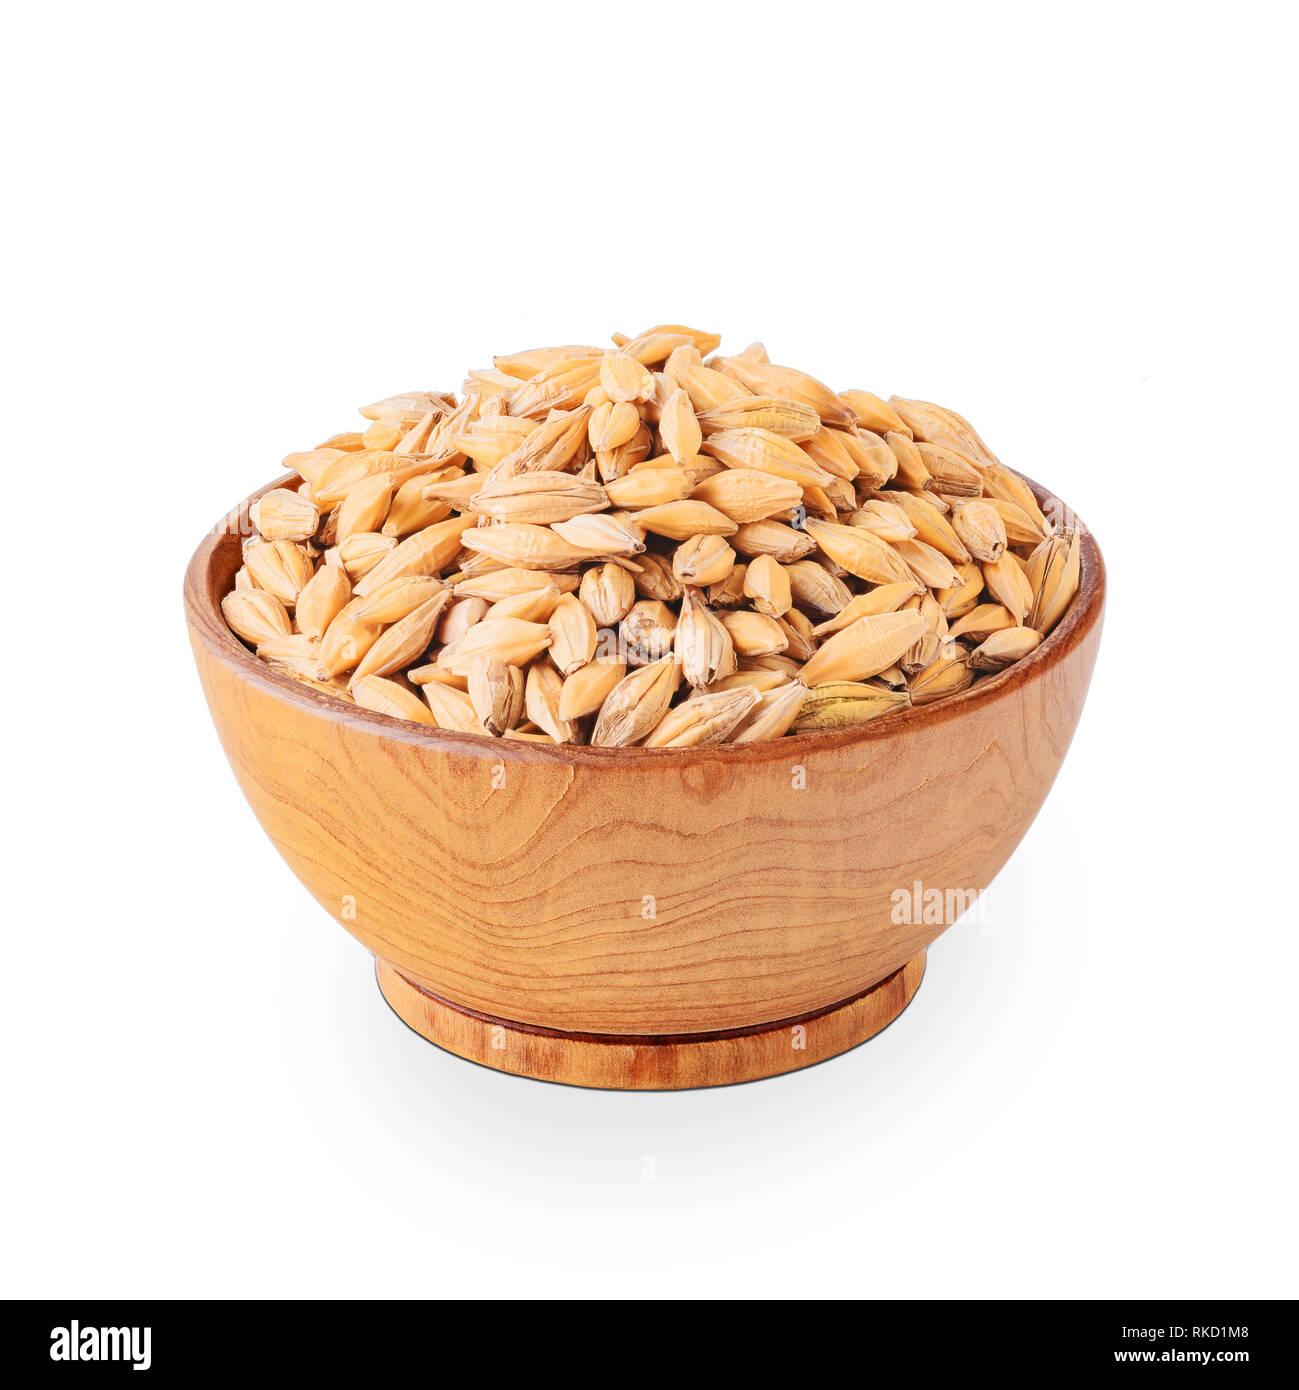 Bowl of barley seeds isolated on white background Stock Photo